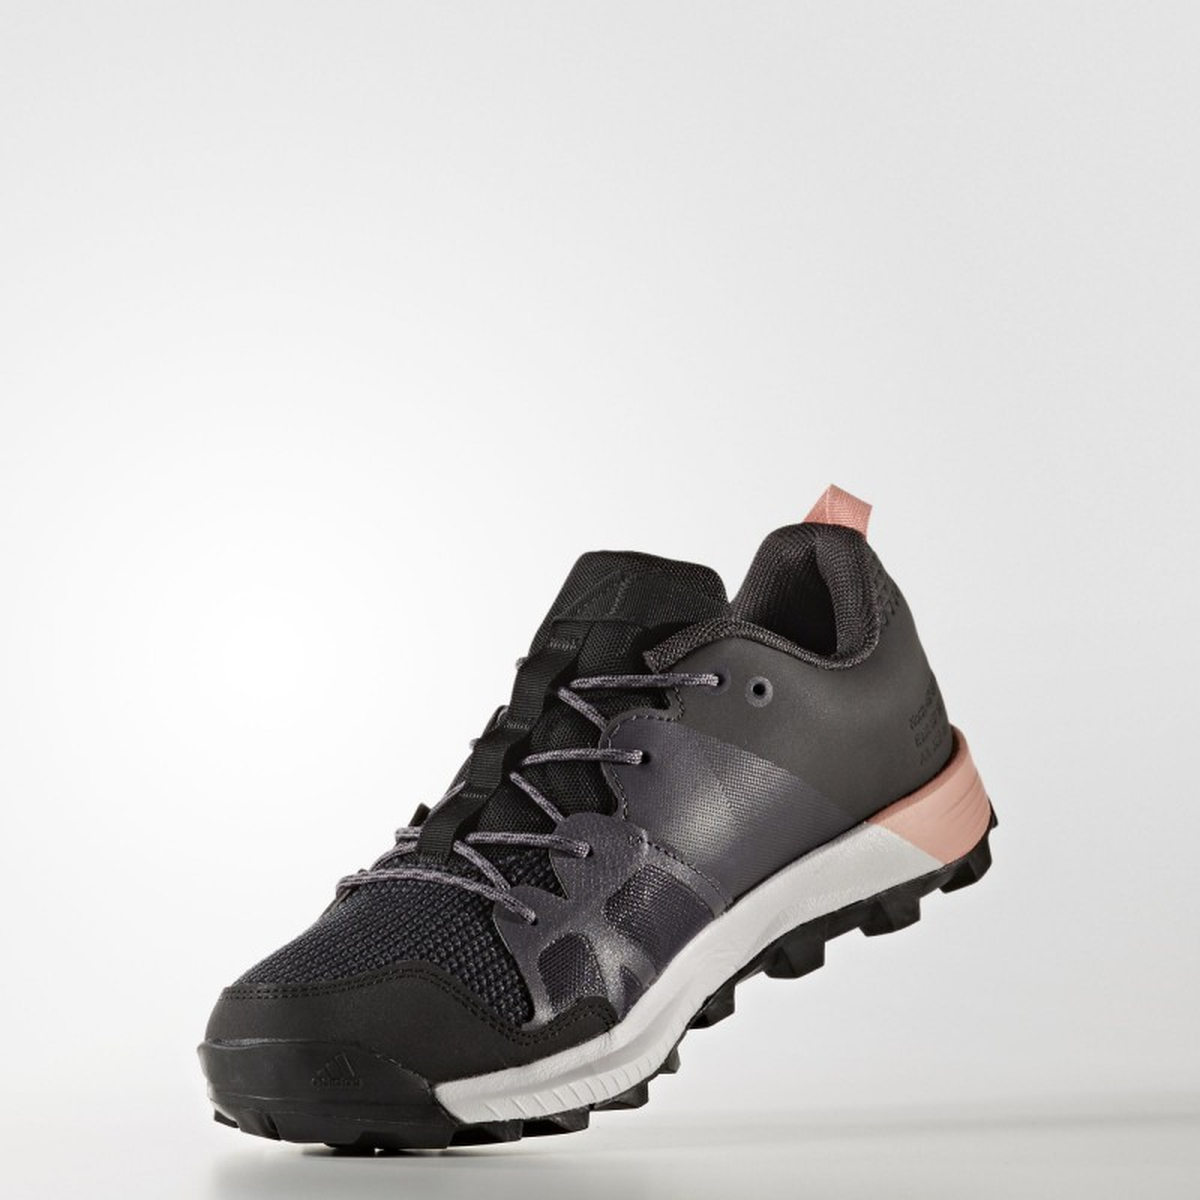 zapatillas adidas kanadia mujer